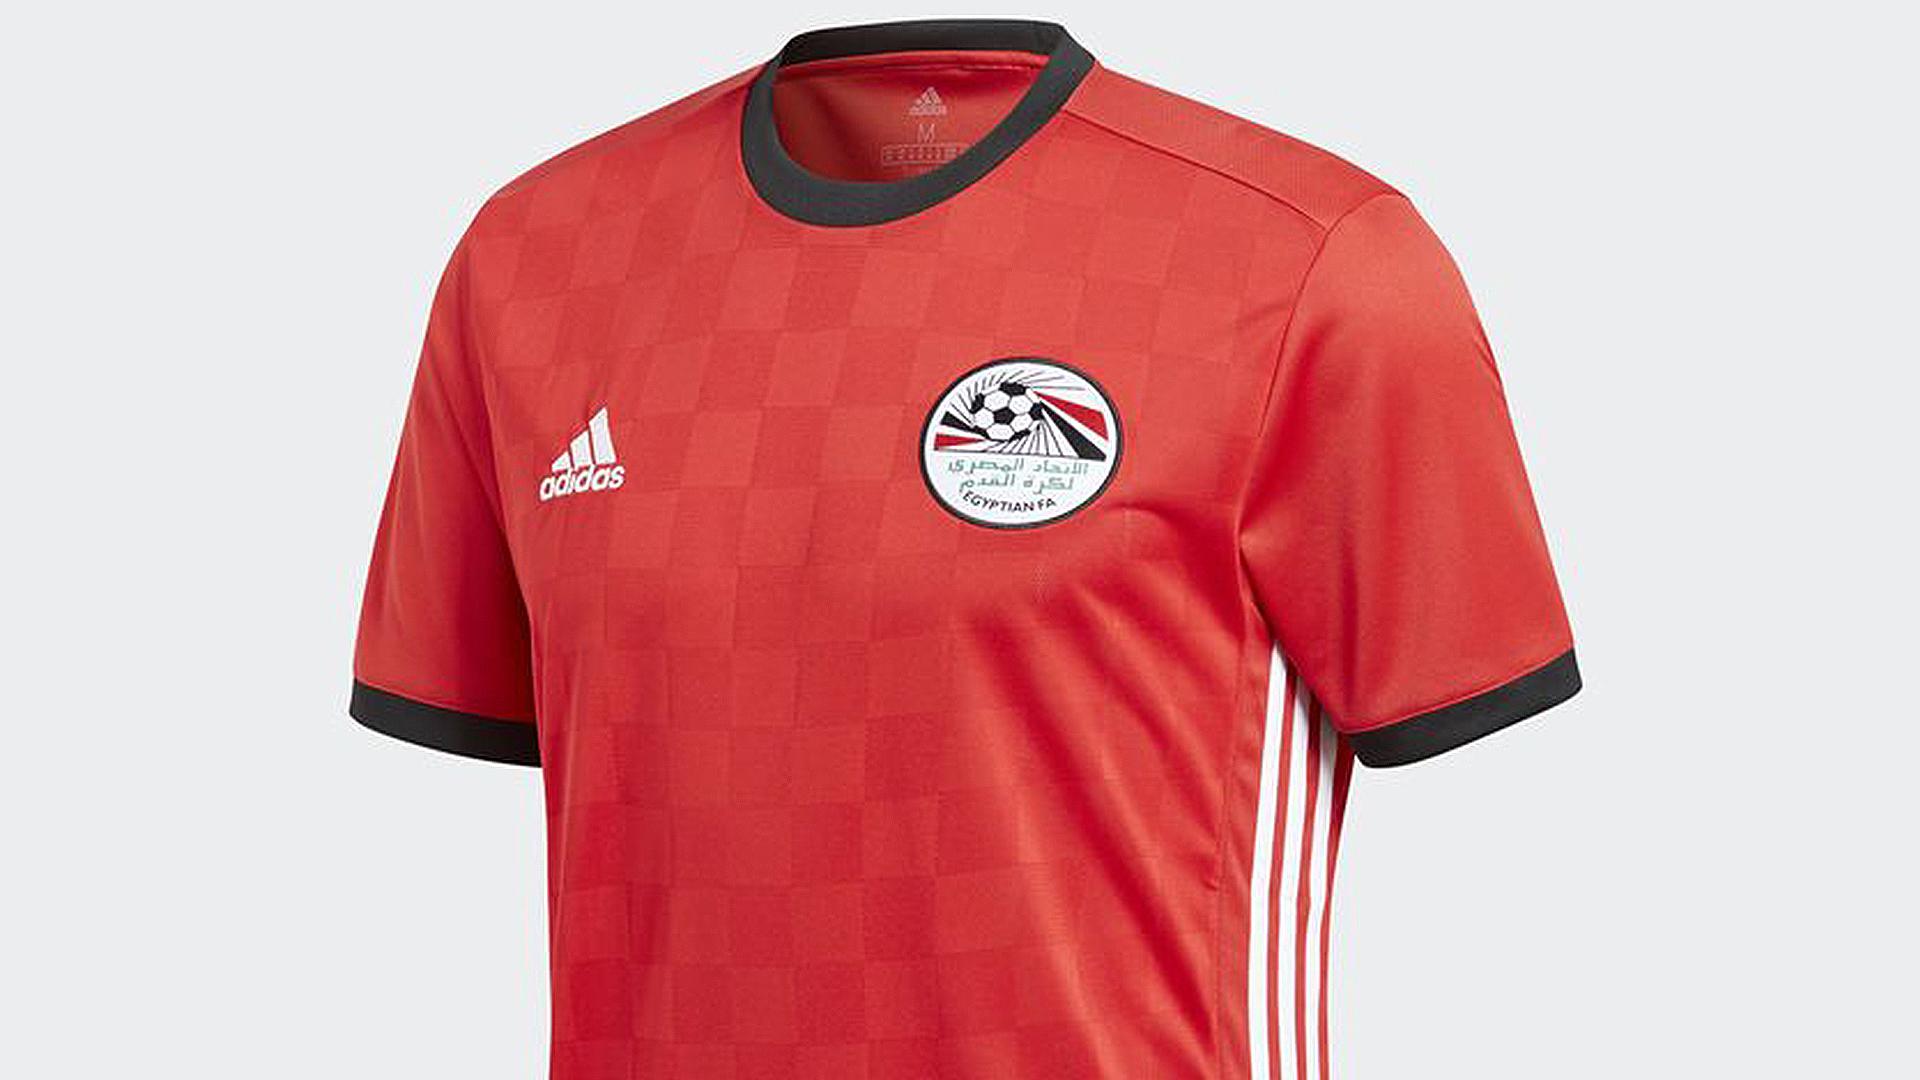 Popular England Jersey World Cup 2018 - egypt-shirt_efzbq65q61xi15tstyetfrkpj  Perfect Image Reference_404542 .jpg?t\u003d-1601610985